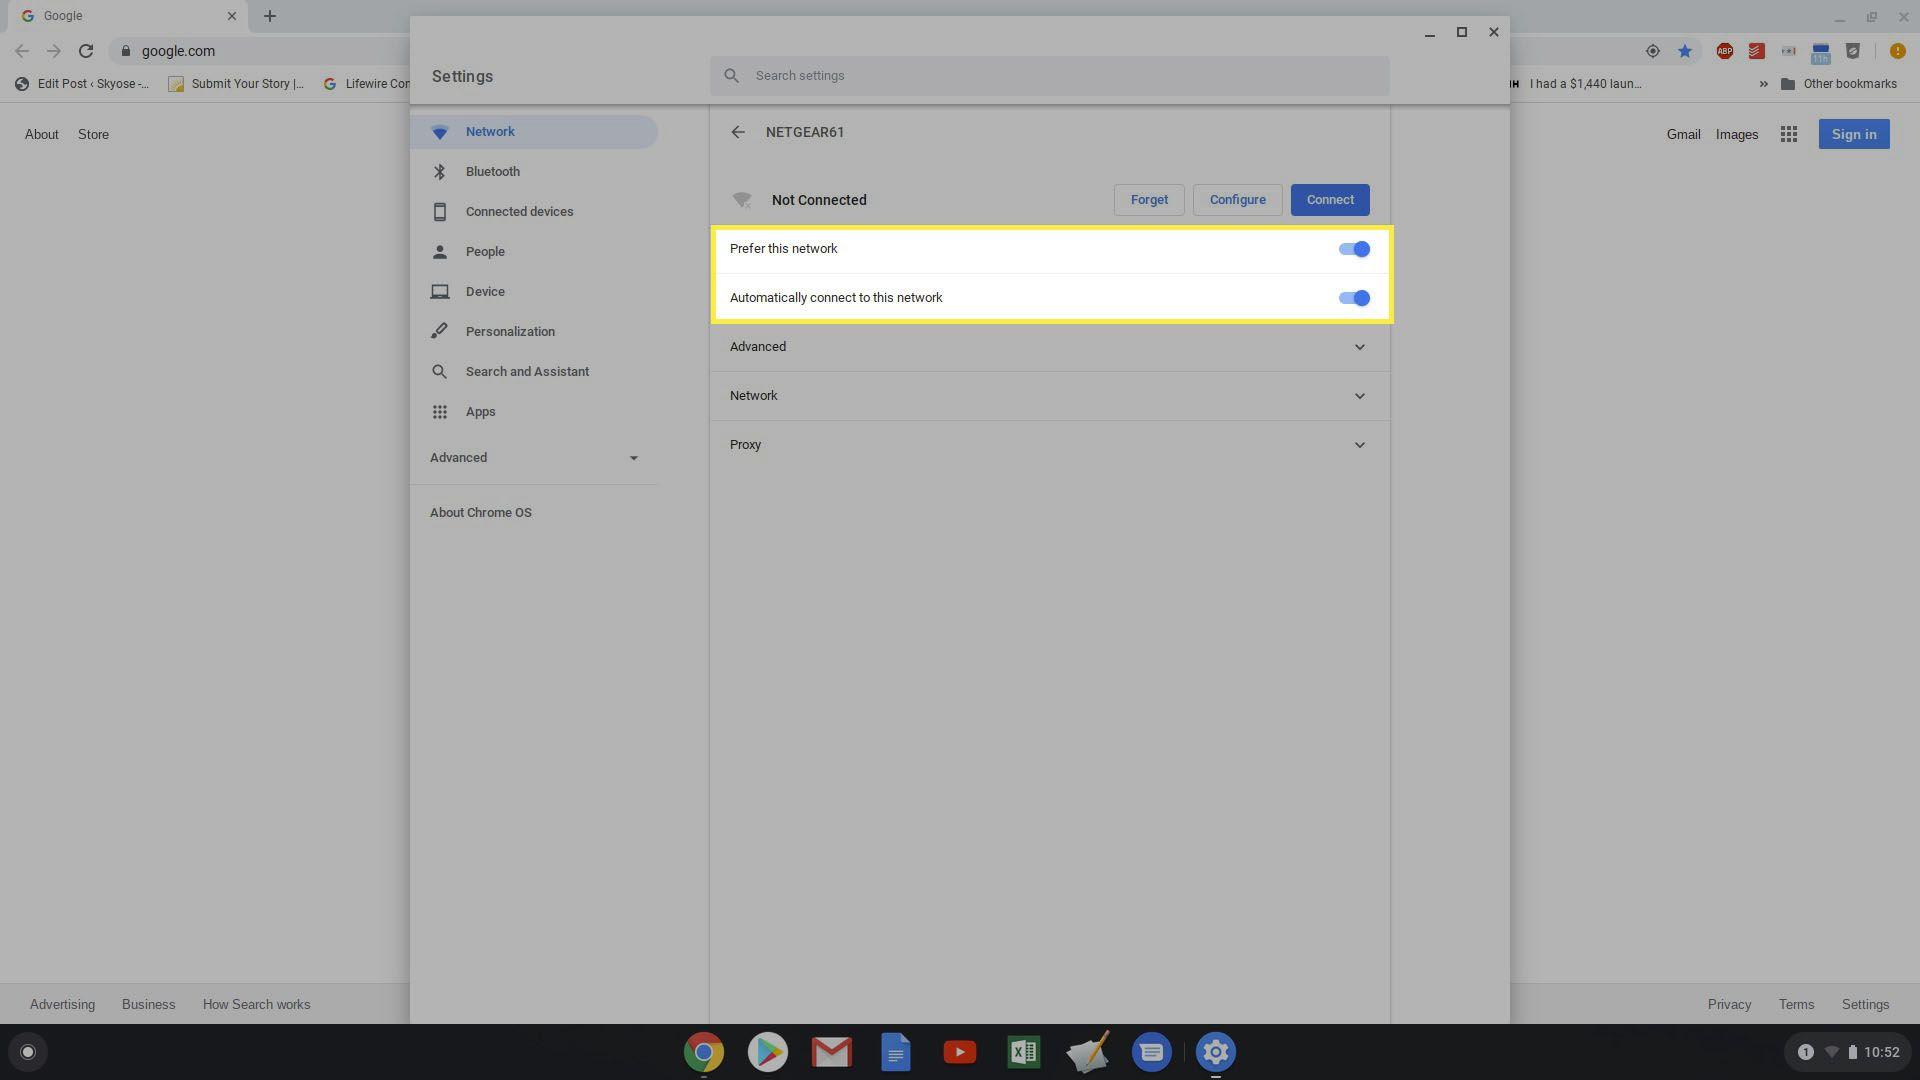 setting a preferred network on Chromebook